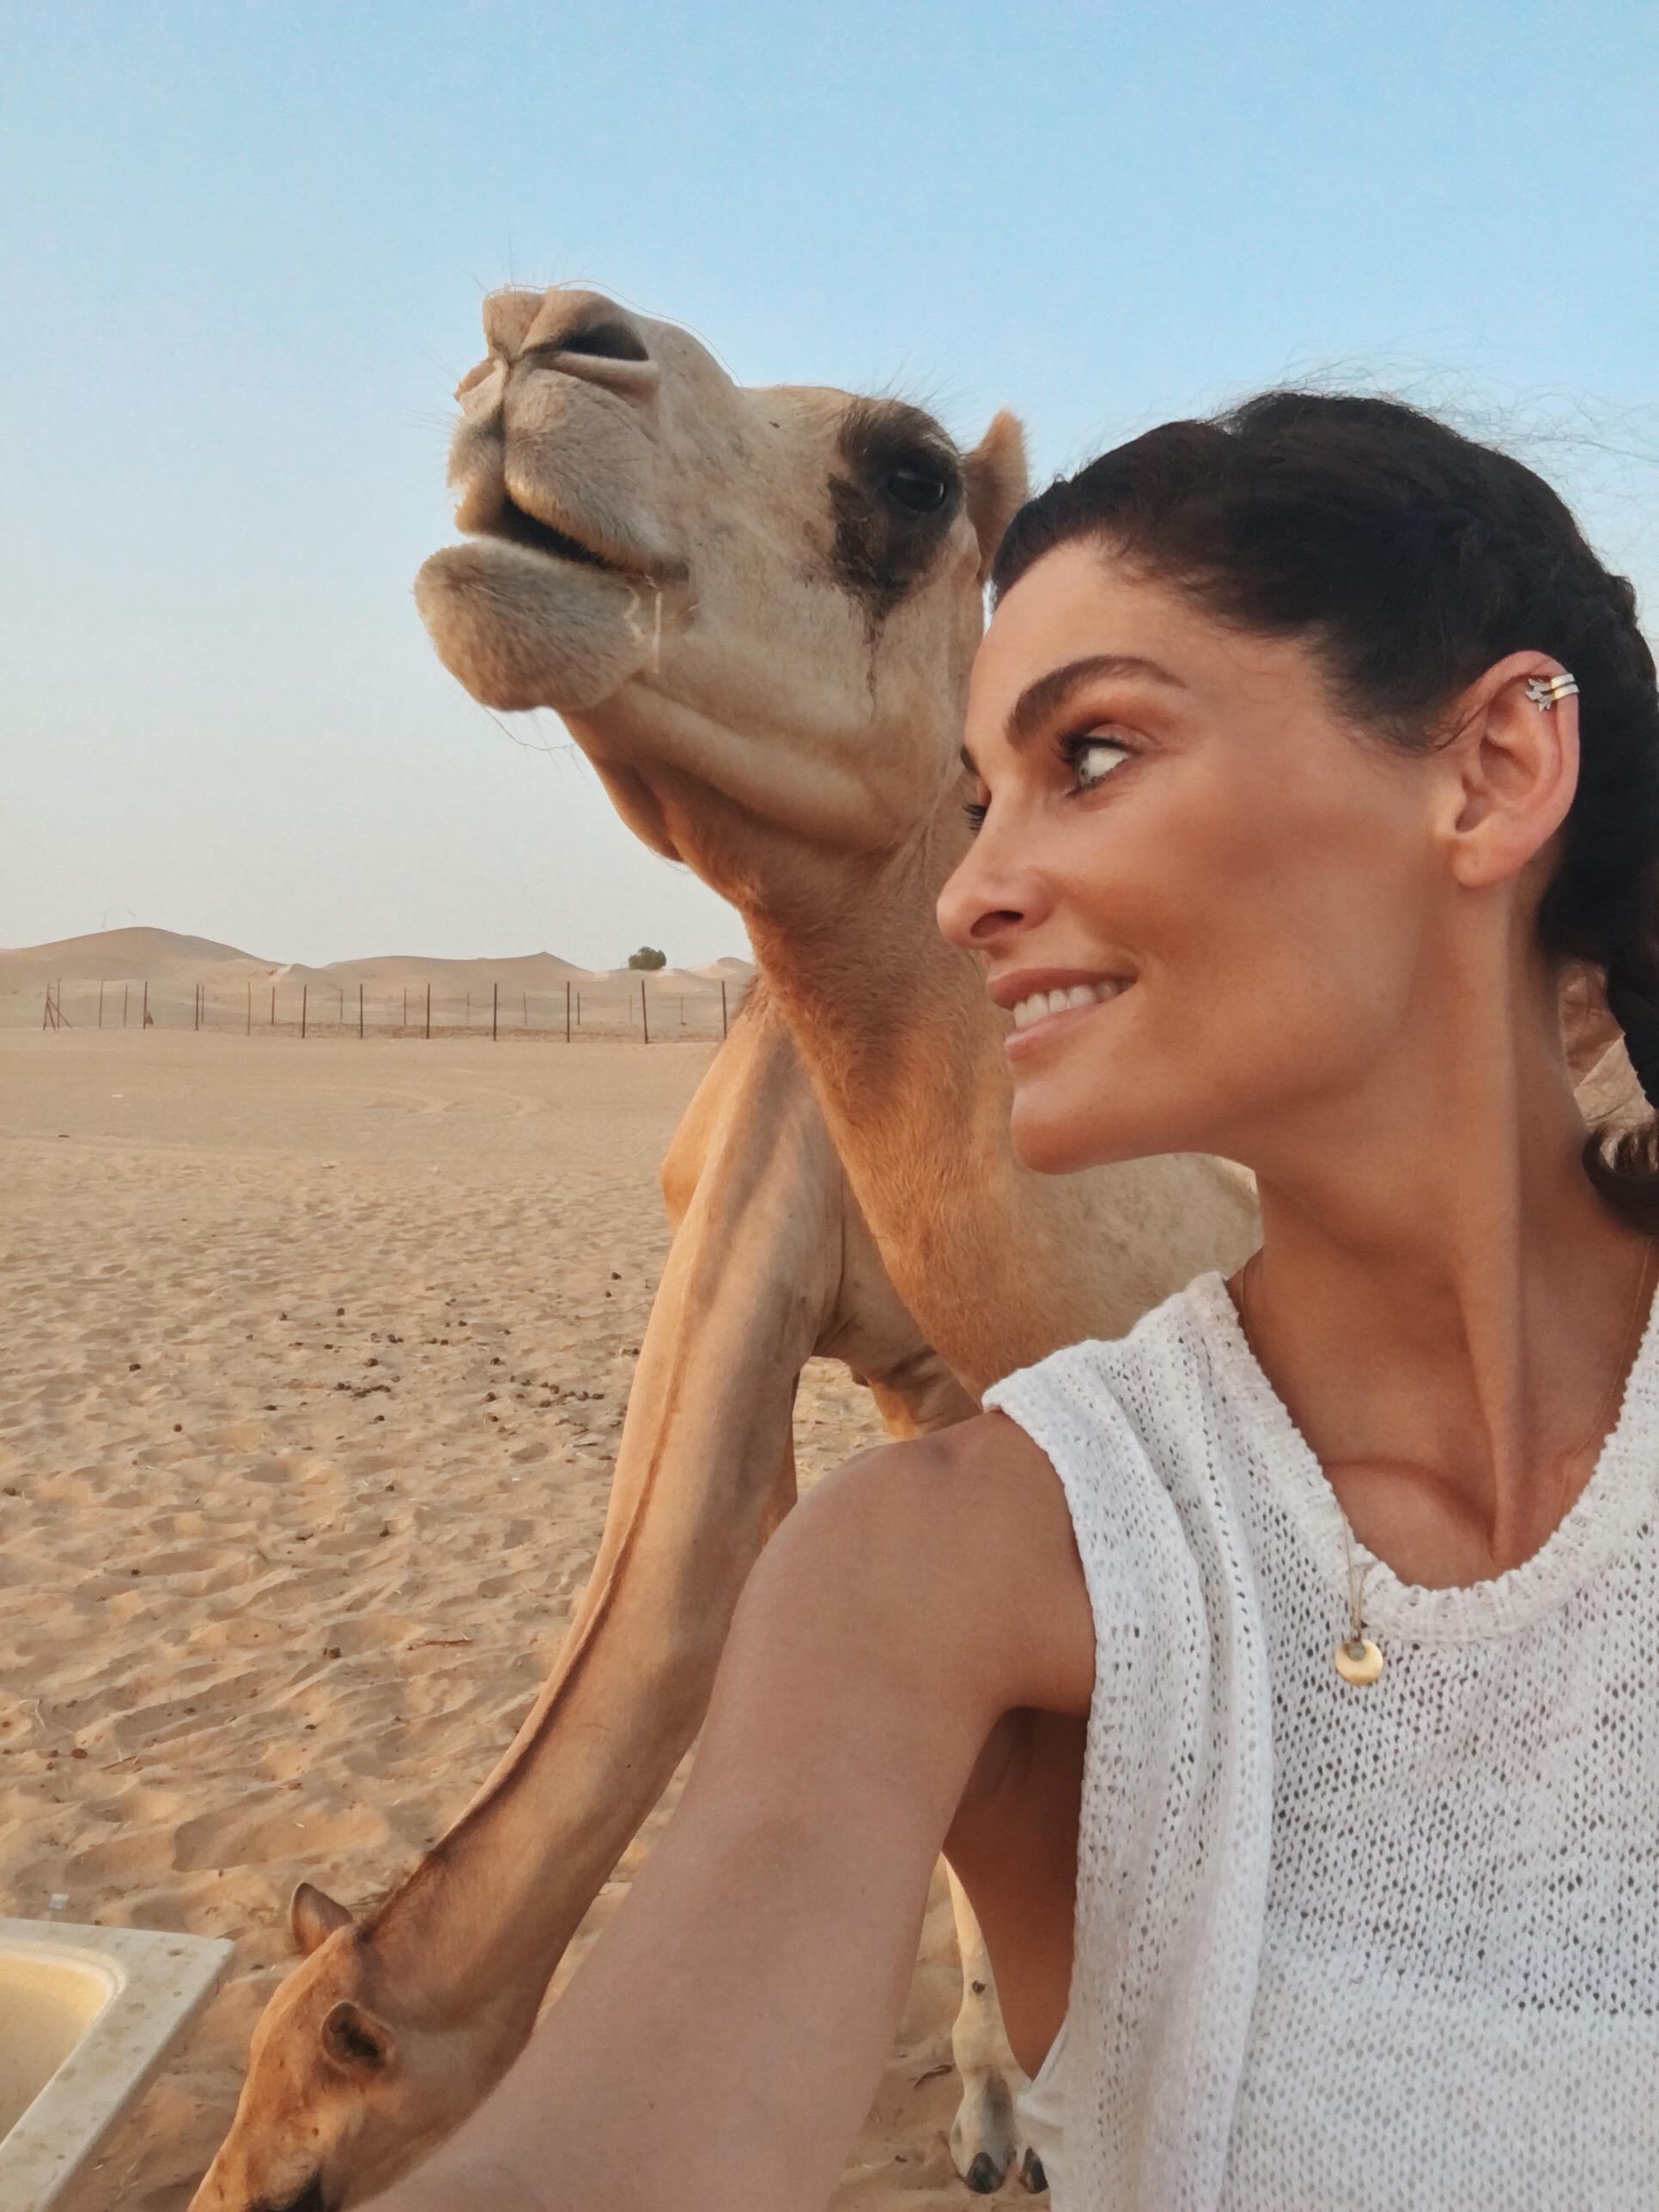 I got my selfie with a camel